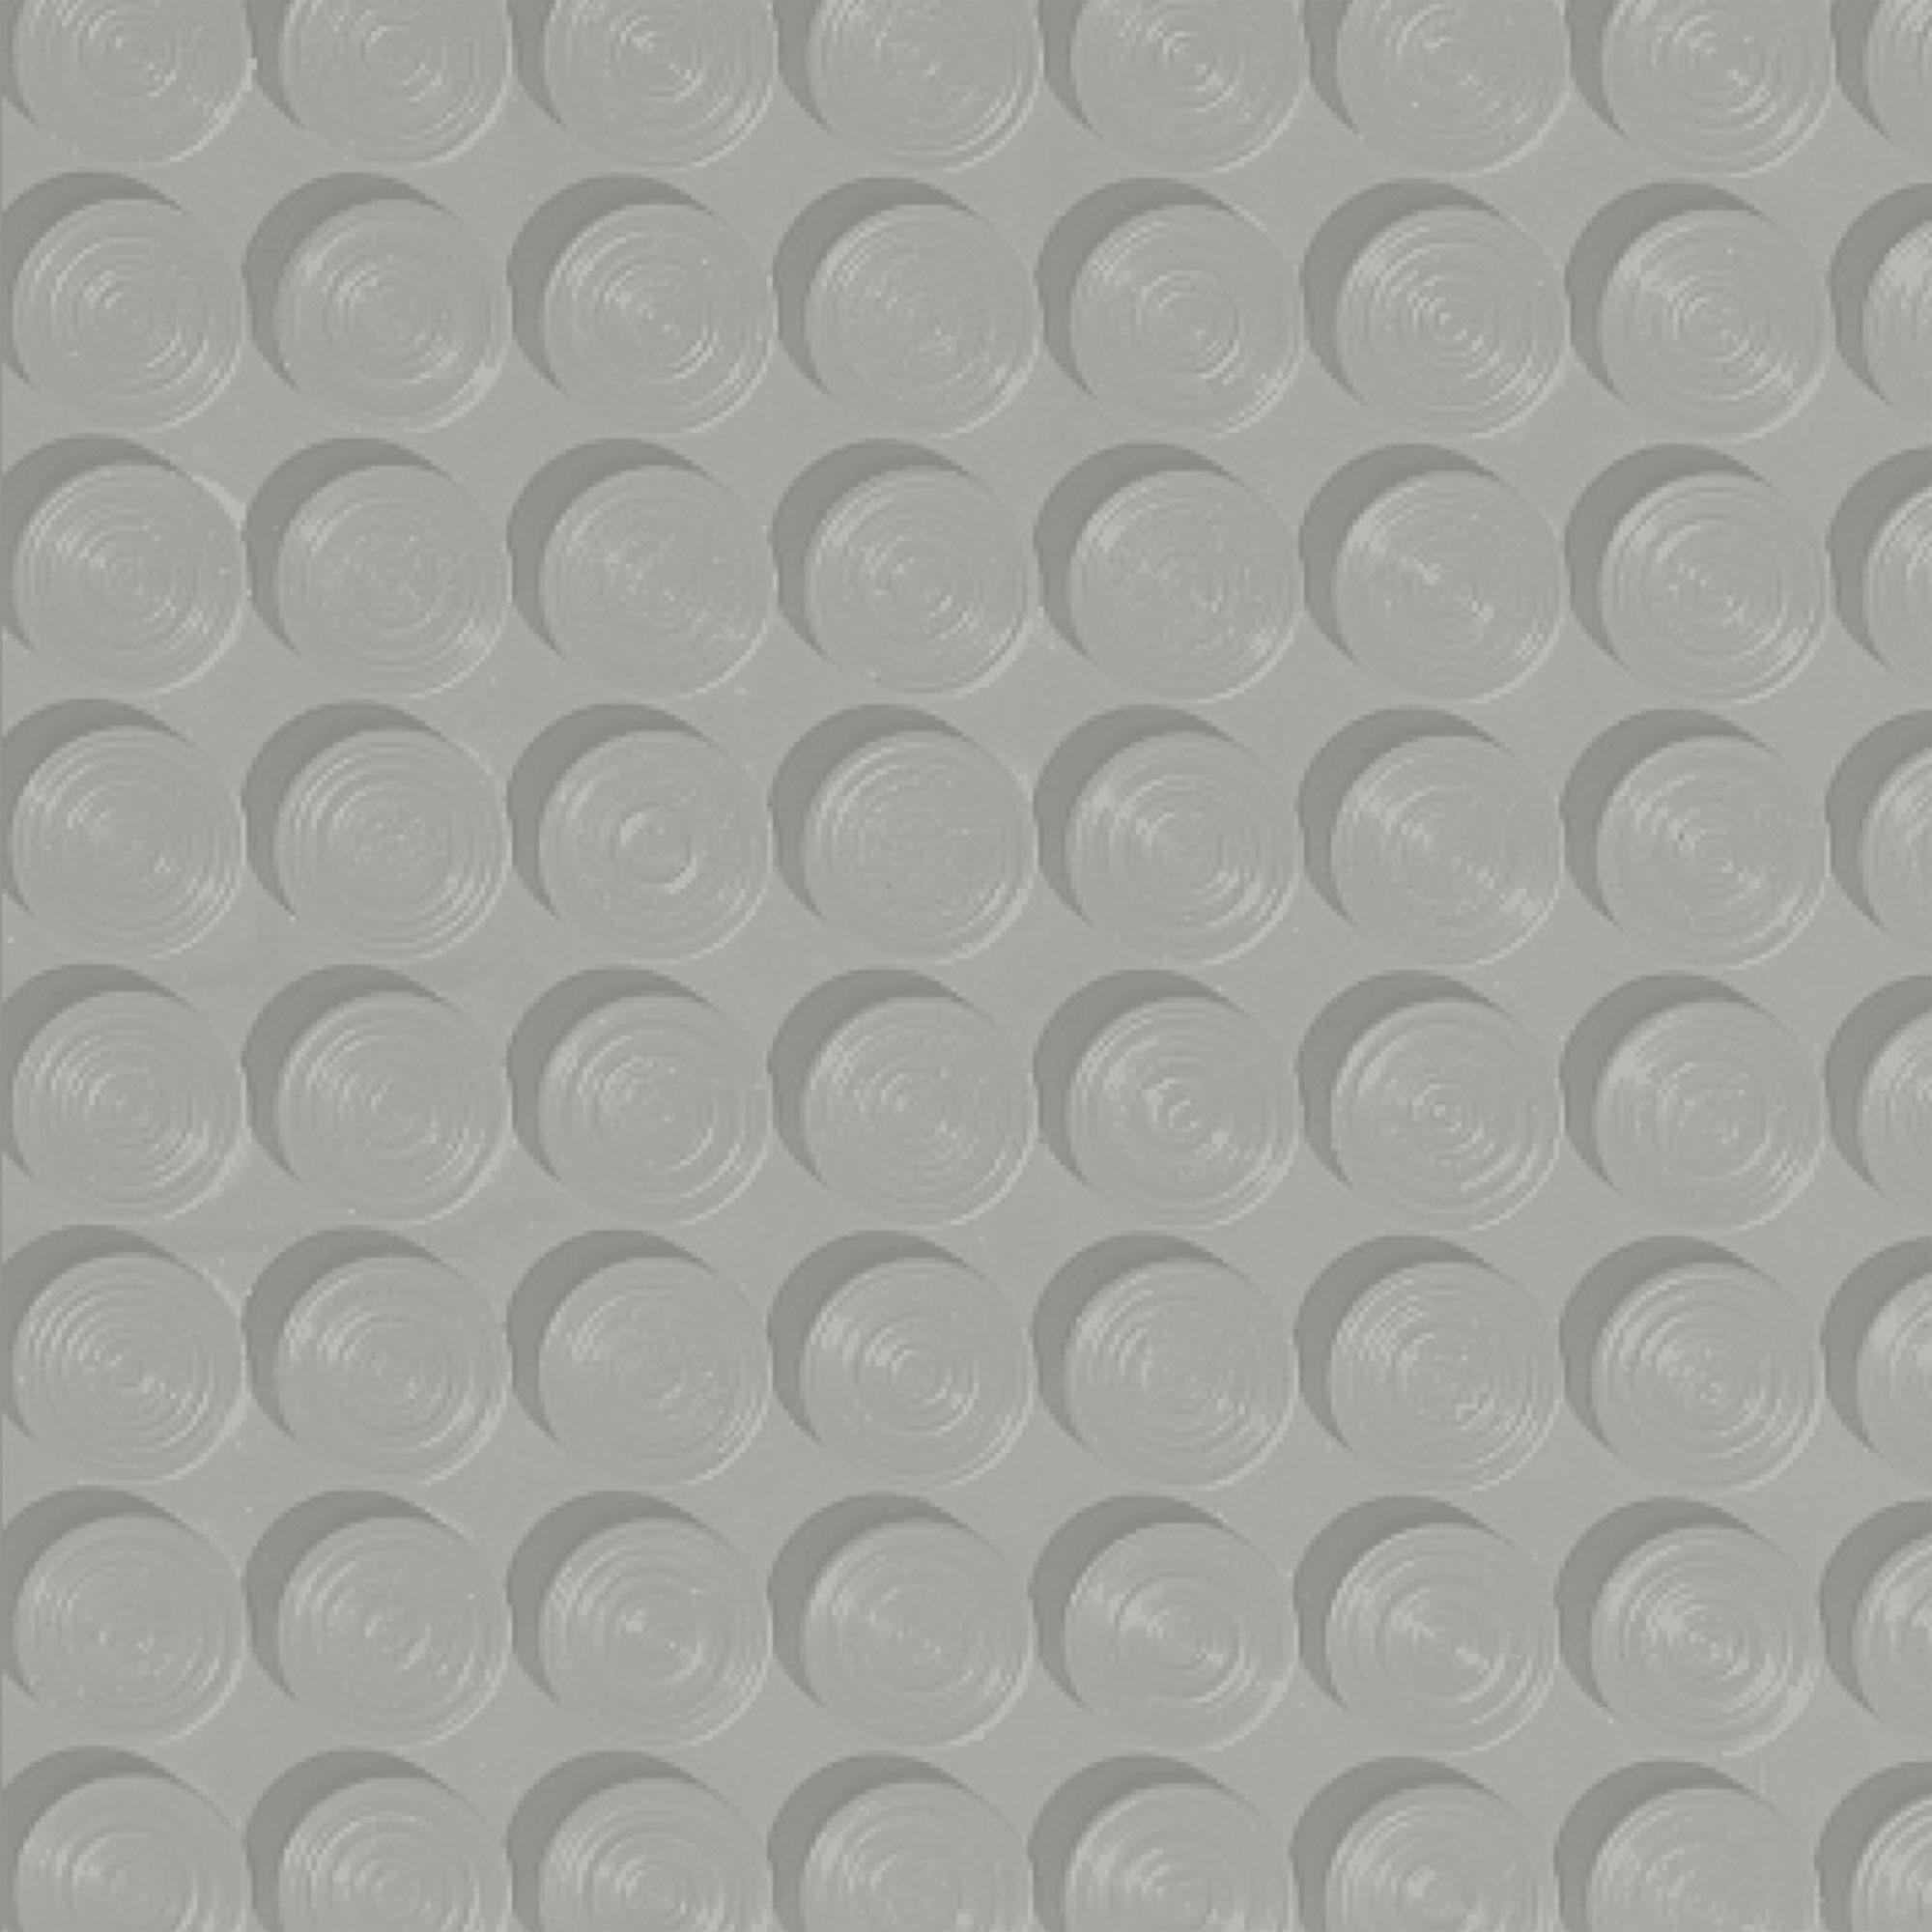 Roppe Rubber Tile 900 - Lug Back Vantage Design (LB996) Light Gray Rubber Flooring